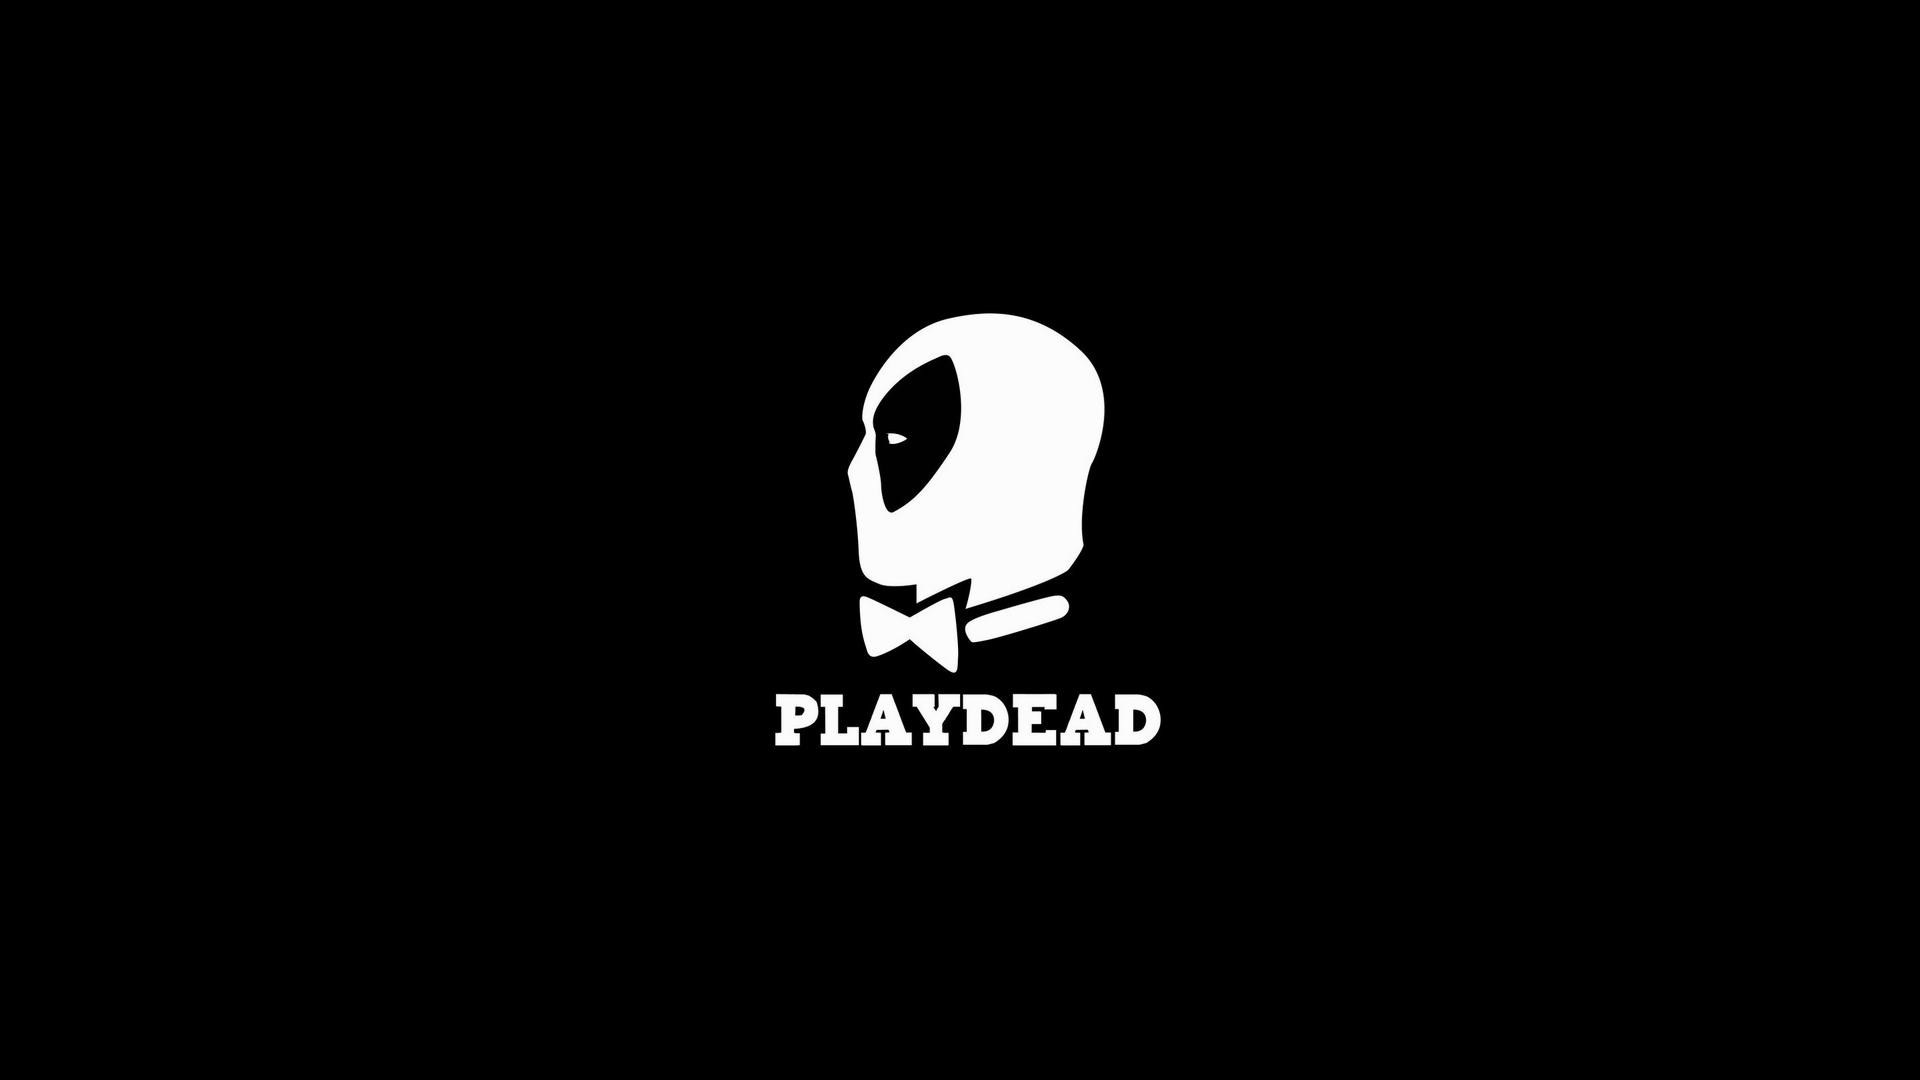 White-Deadpool-Logo-Wallpapers-HD